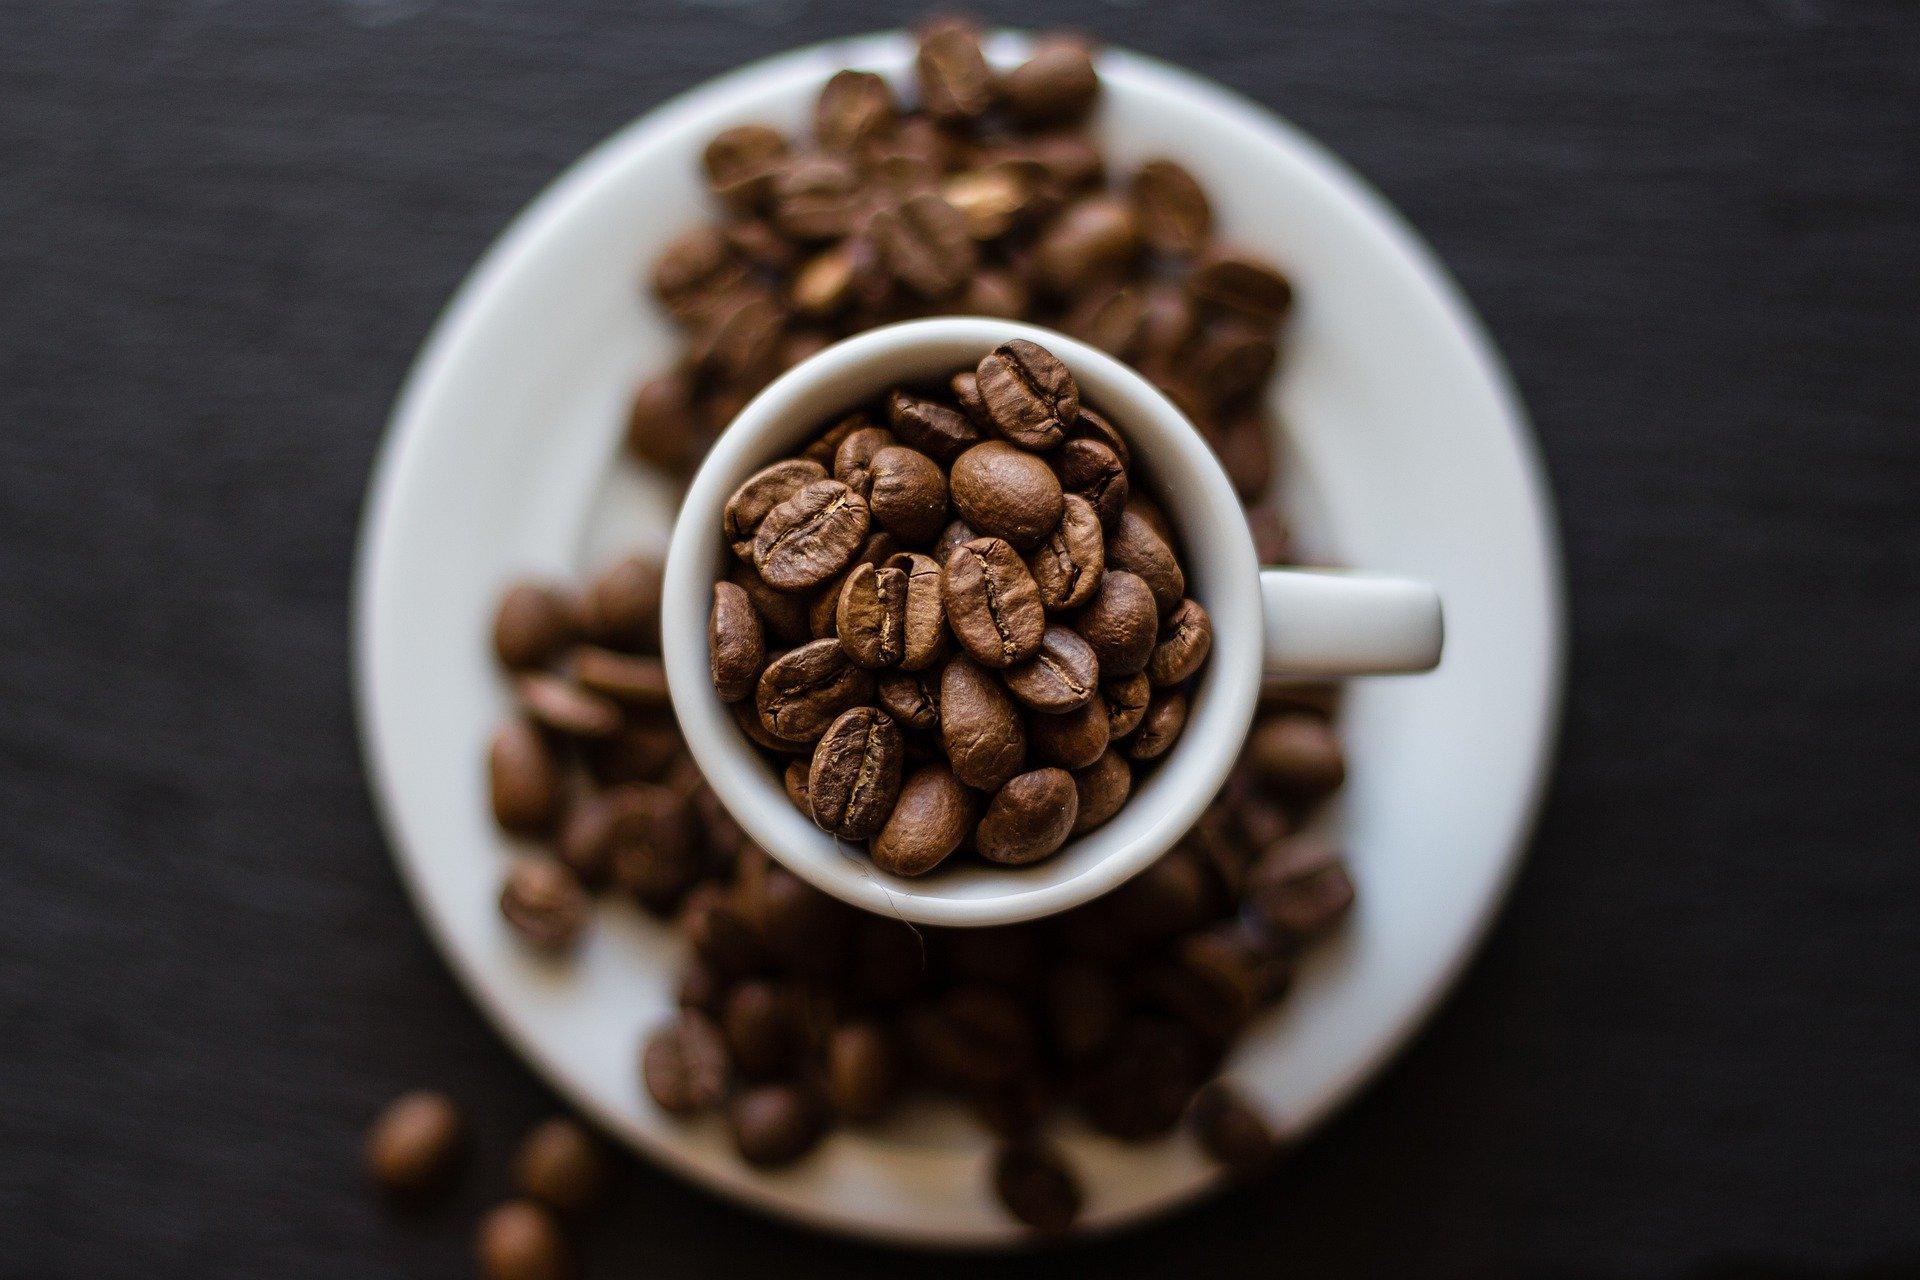 /article/thumbnail.asp?thumb=coffee%2D6464307%5F1920%2Ejpg